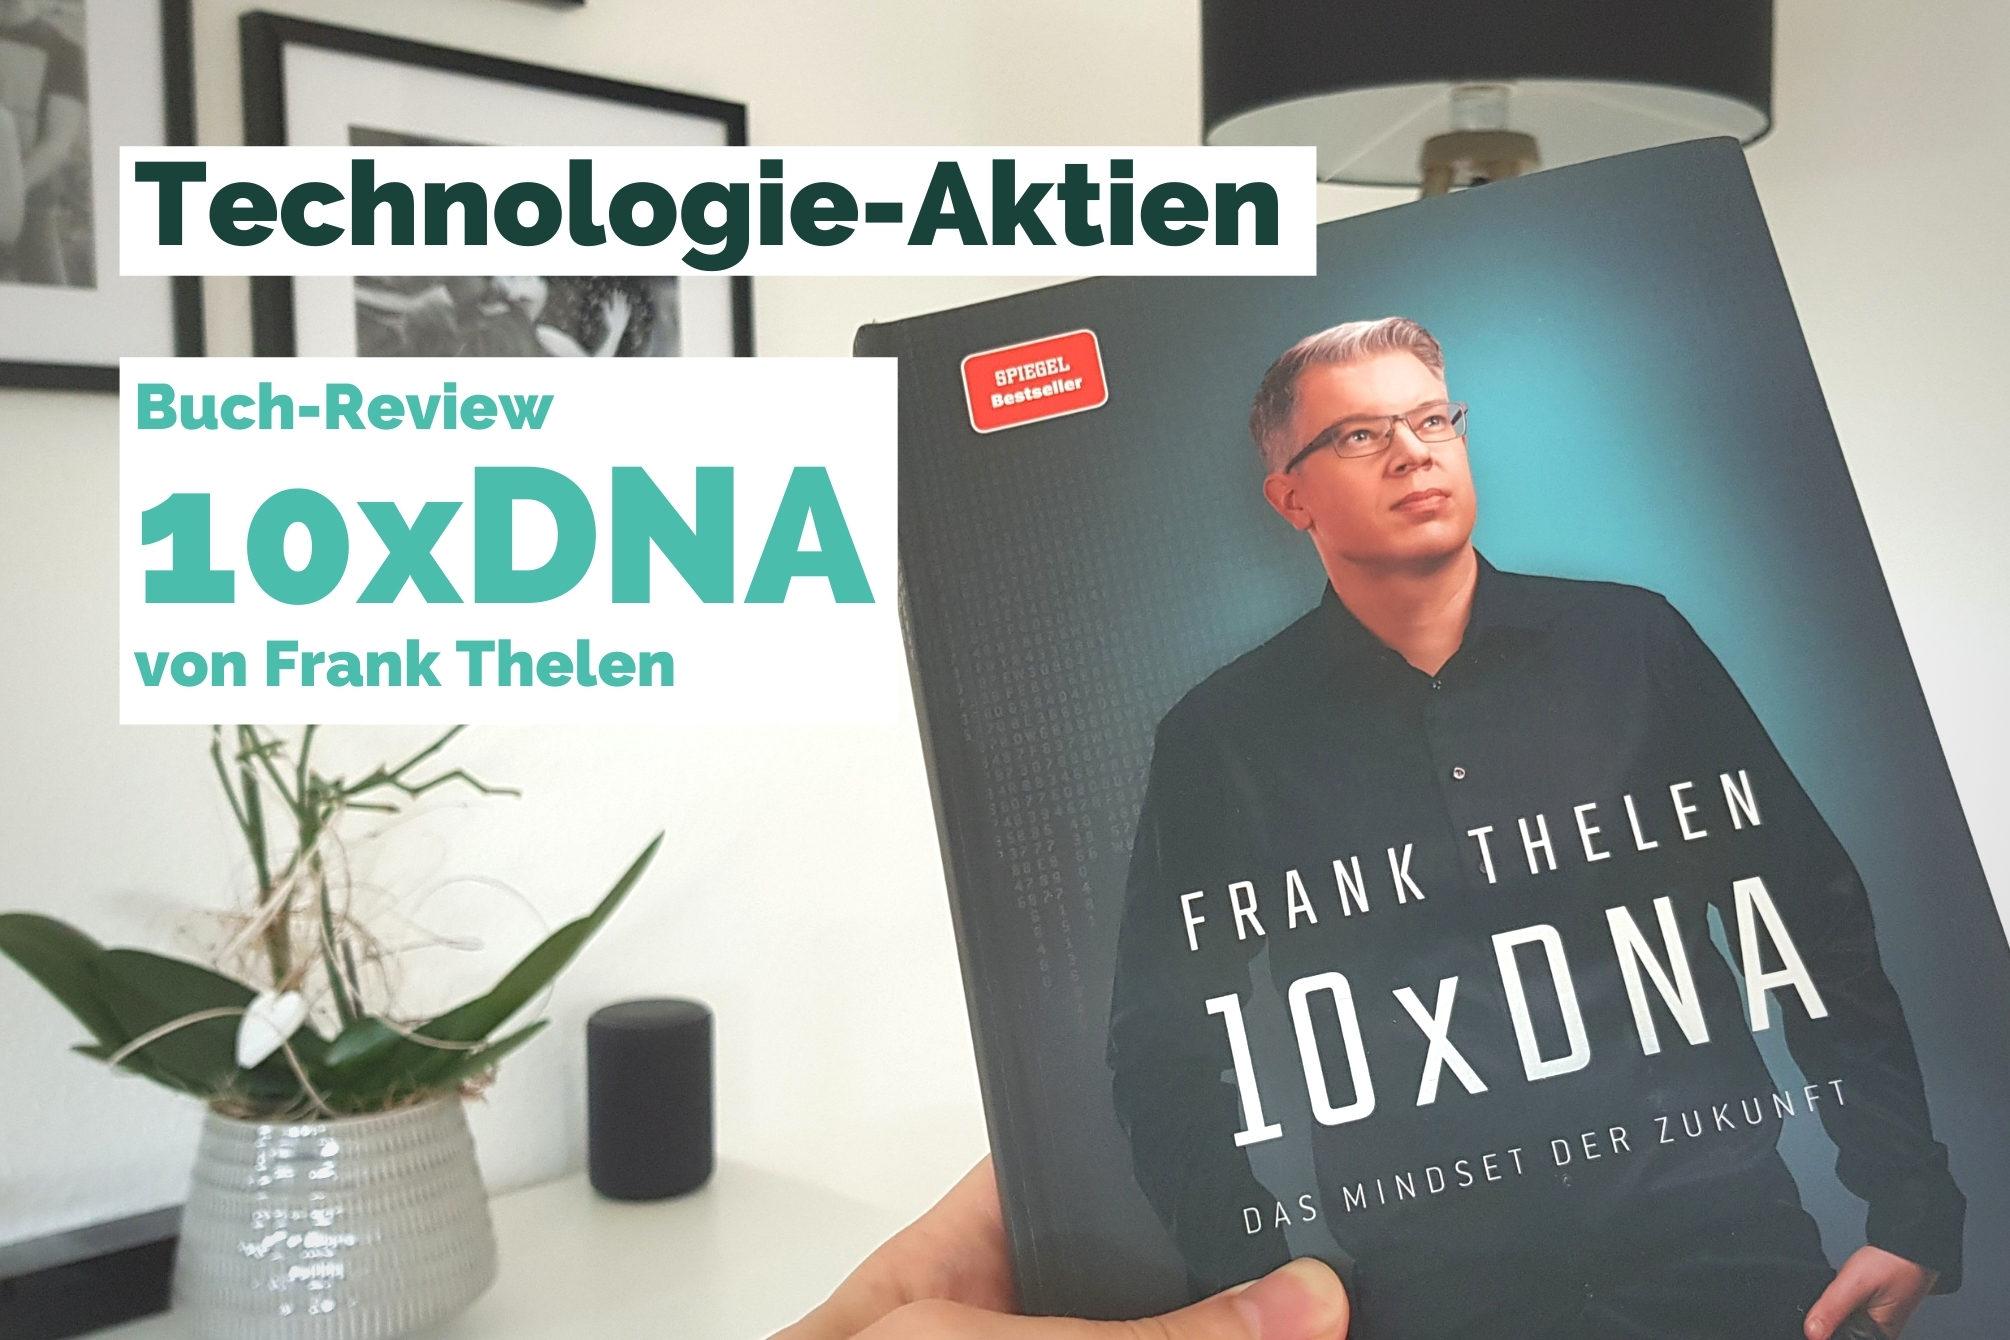 Technologie-Aktien 10xDNA Frank Thelen